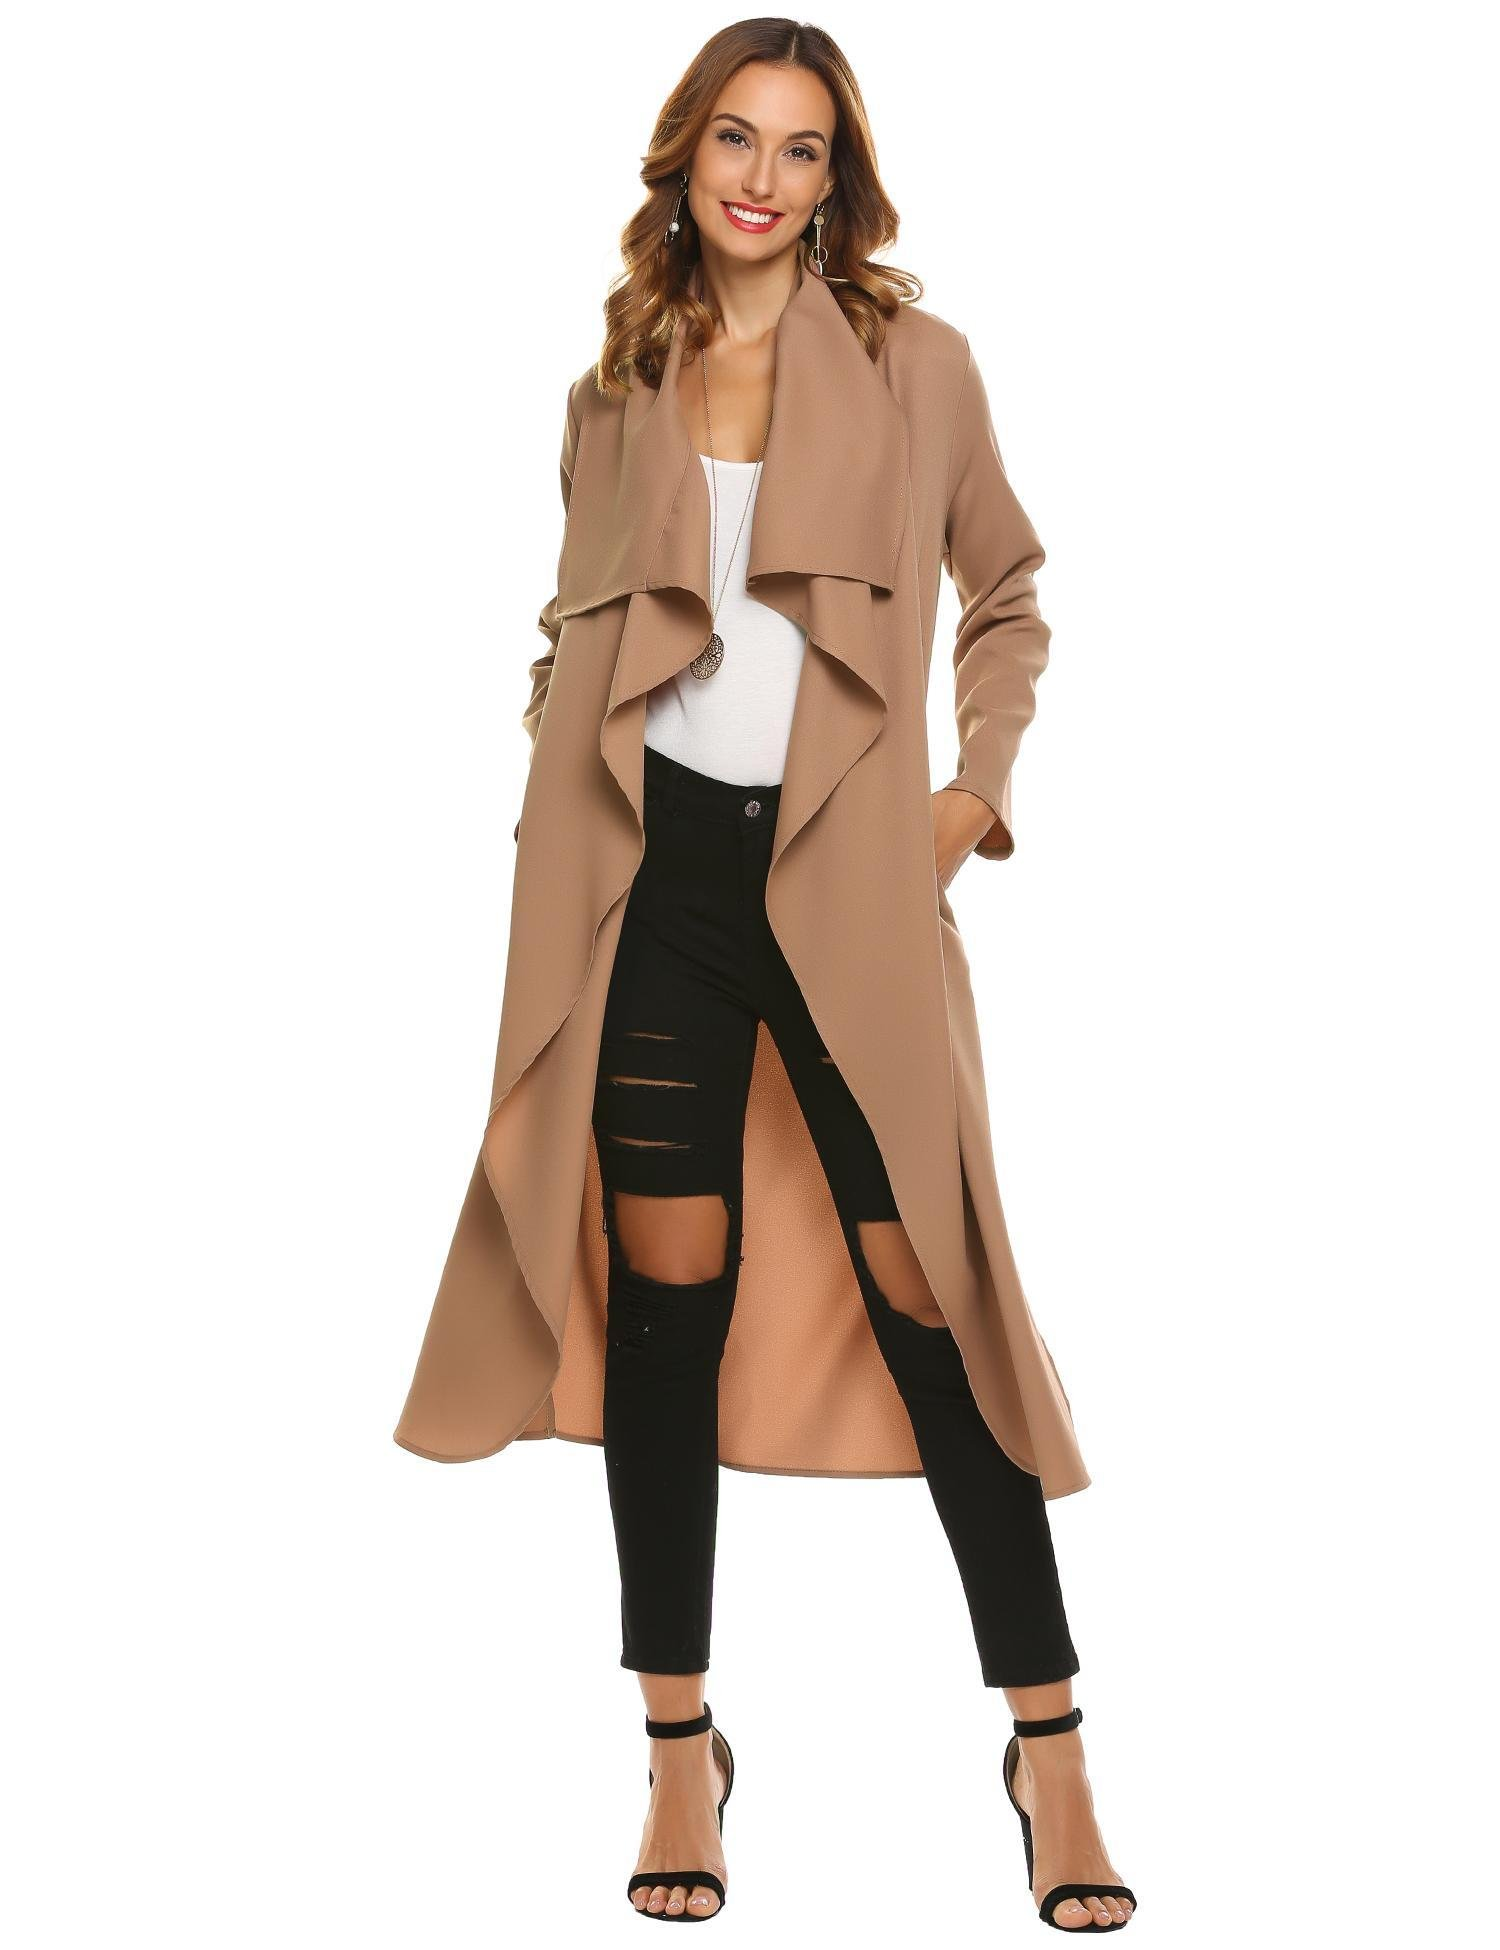 Vansop Women's Women's Casual Long Sleeves Notch Collar Outwear Trench Coat Cardigan Trench Coat